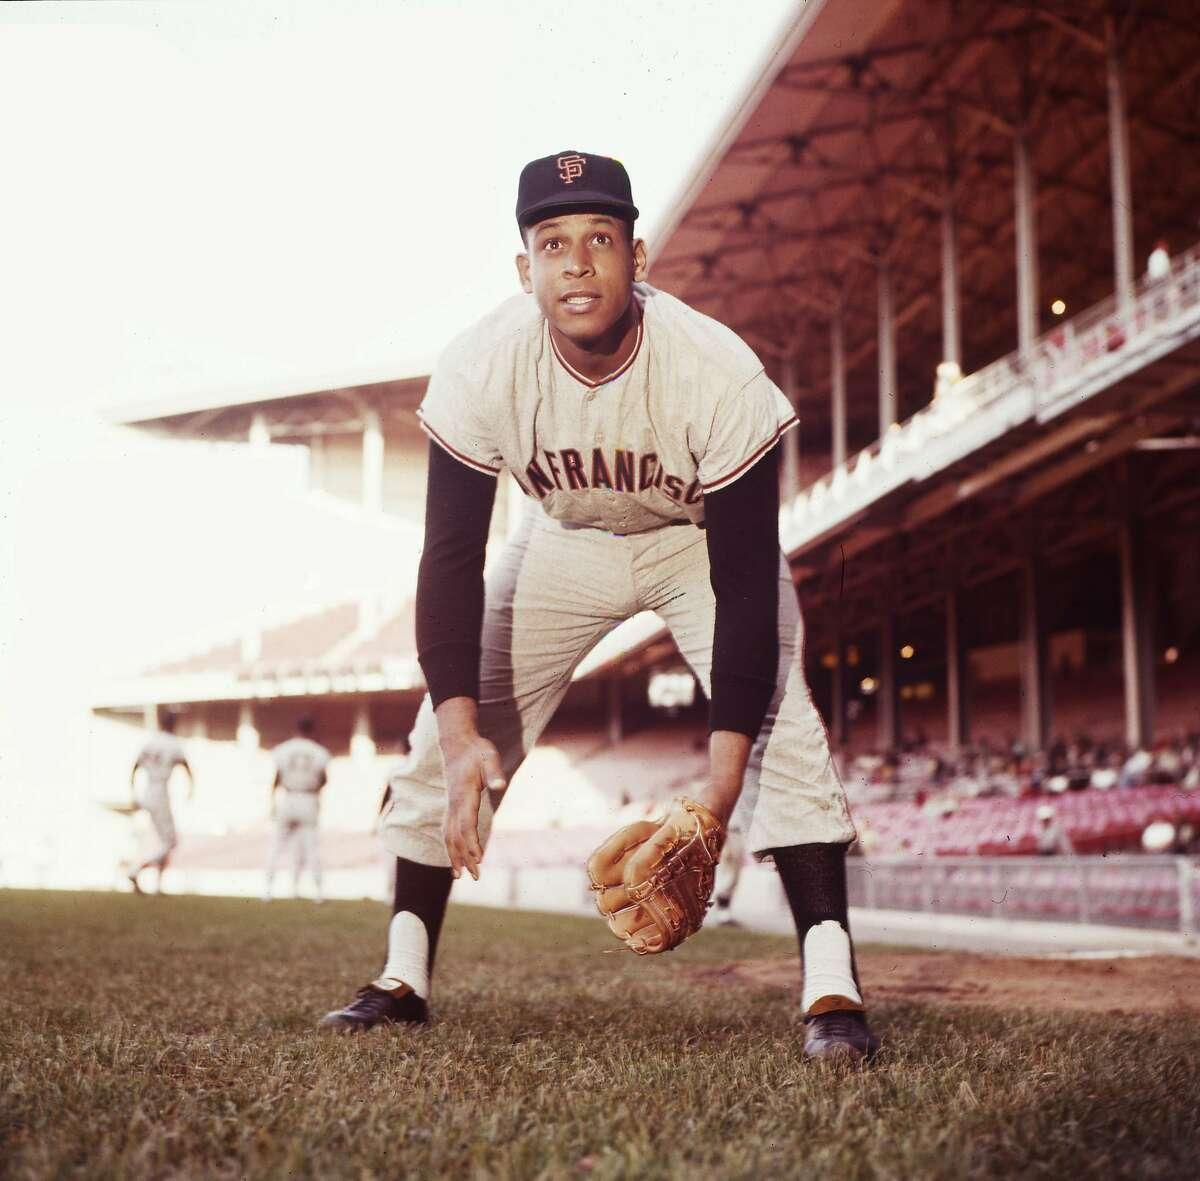 Orlando Cepeda, in his rookie season, visits Connie Mack Stadium in Philadelphia in the summer of 1958.